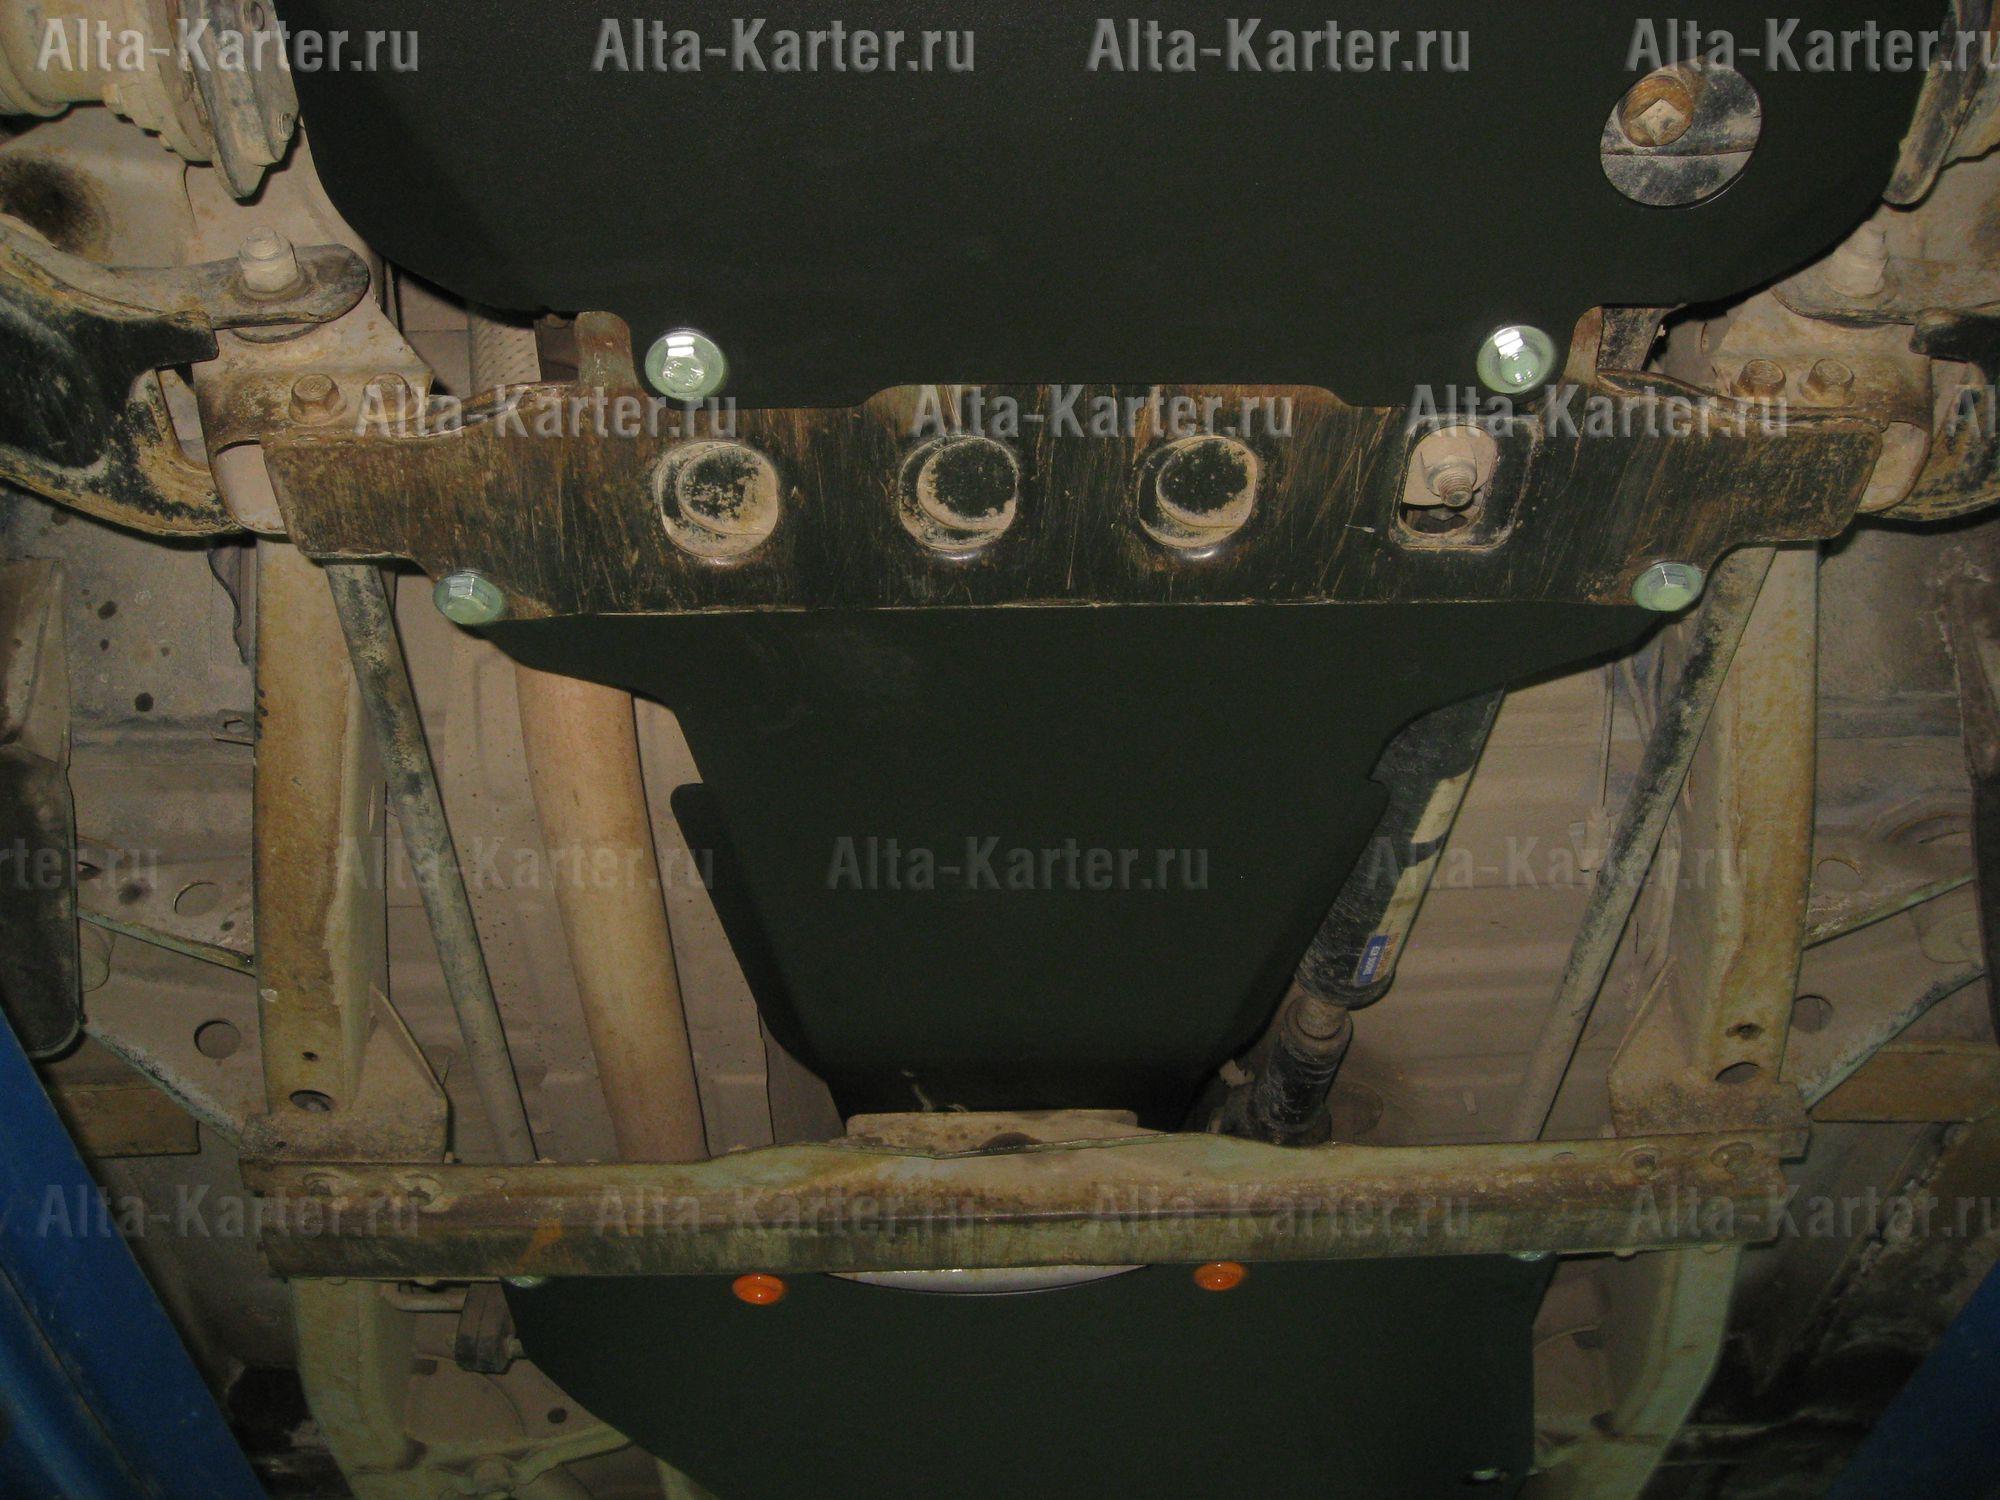 Защита Alfeco для КПП Tager 2008-2011. Артикул ALF.32.02